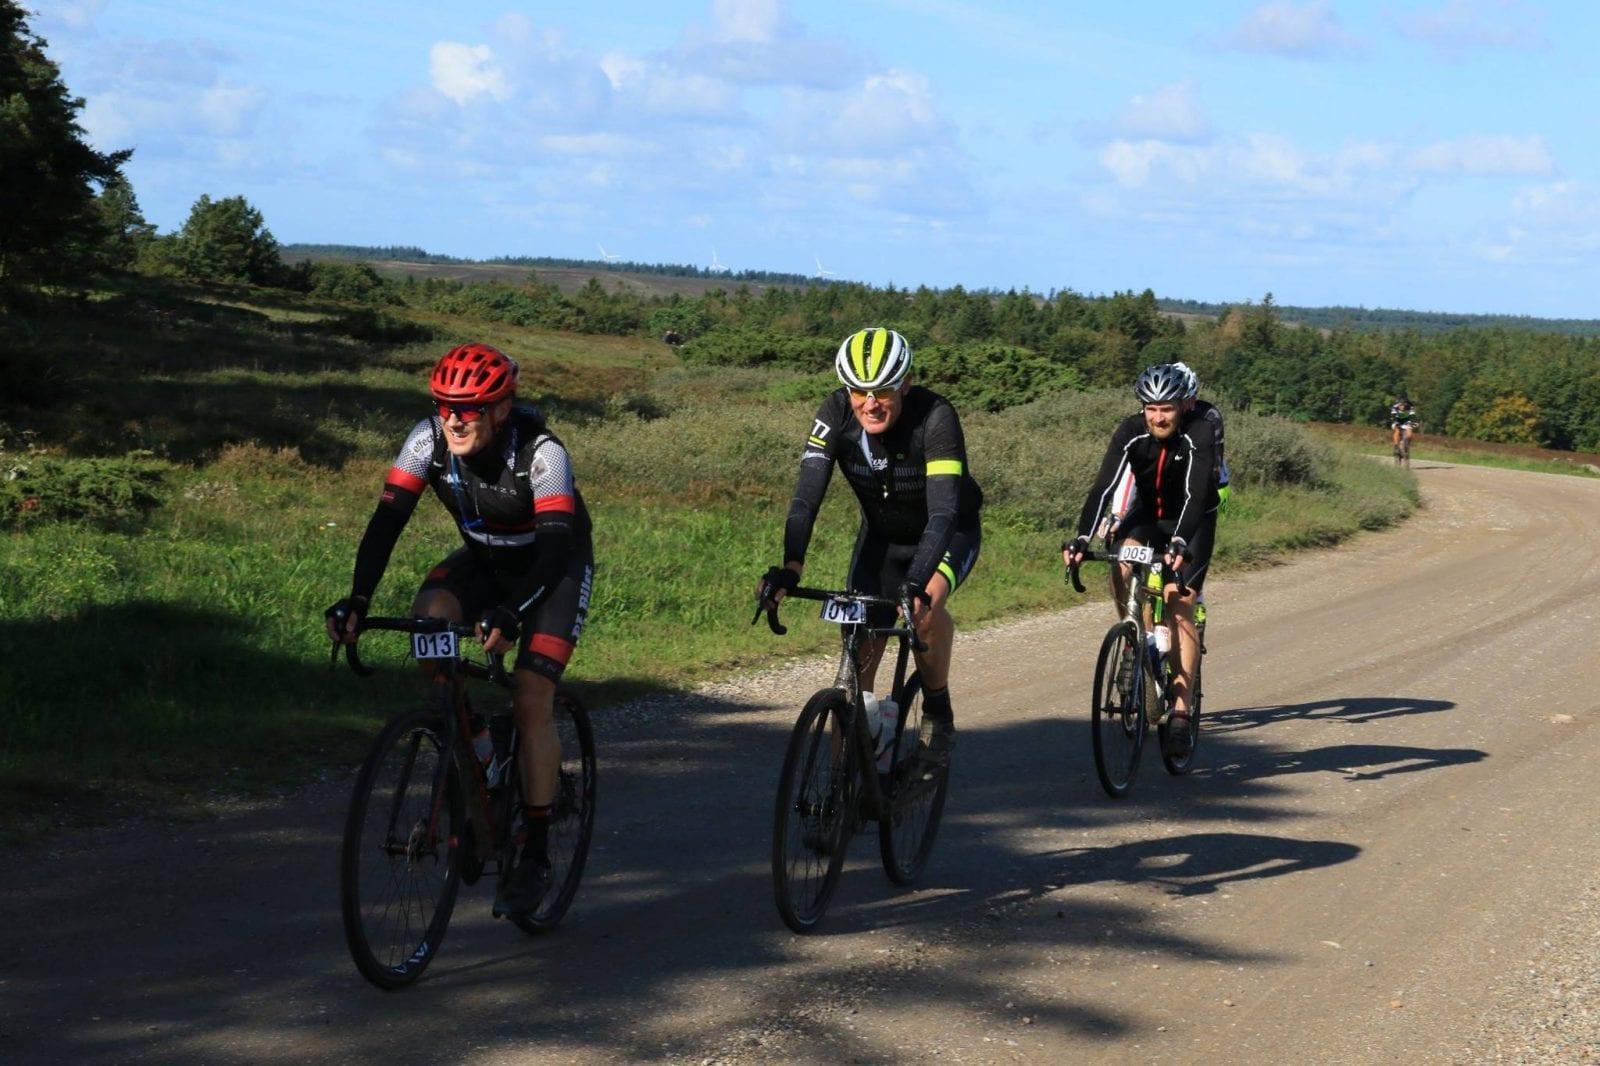 Holstebro Gravel Race 2018 AltomCykling.dk